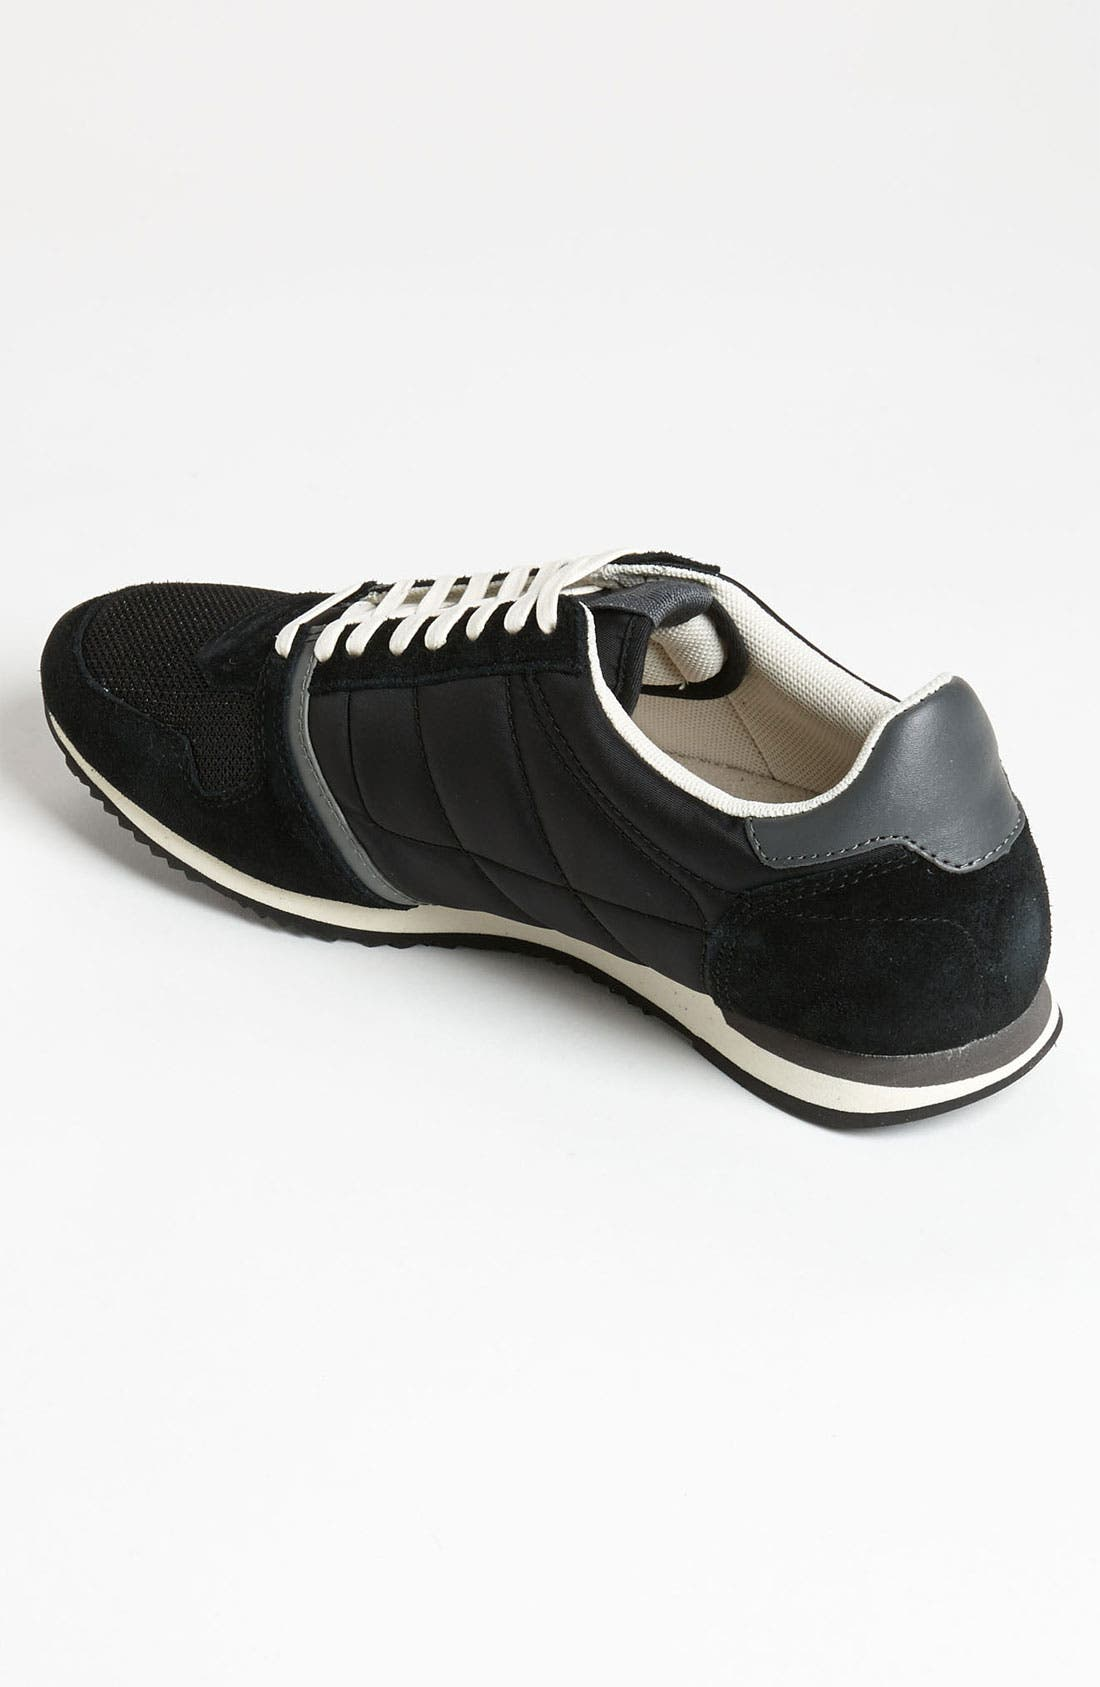 Alternate Image 2  - G-Star Raw 'Track Futura' Sneaker (Men)